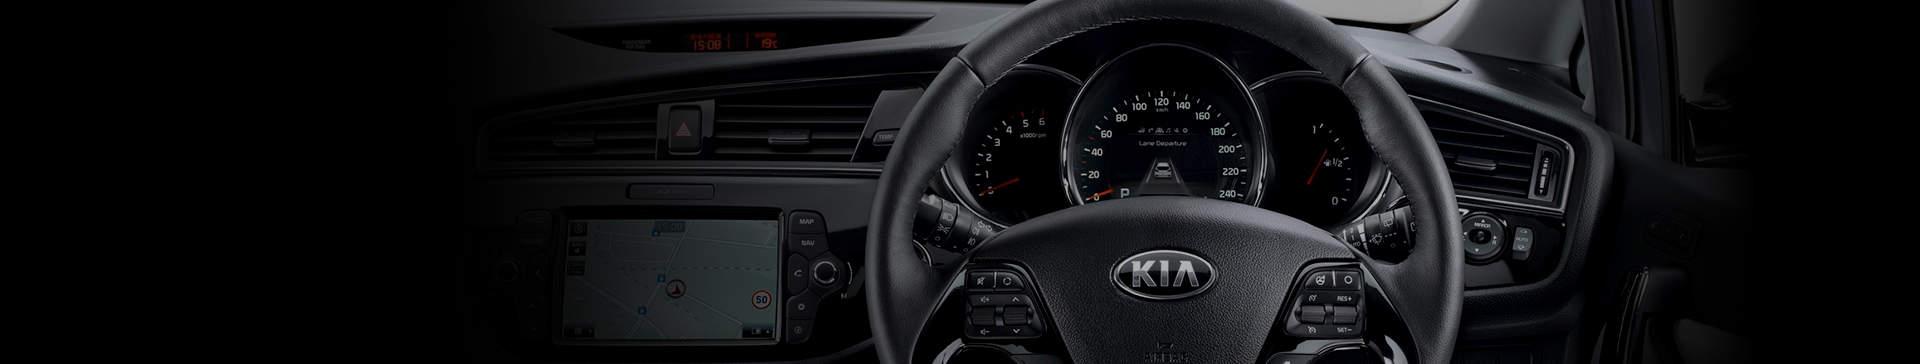 Kia New Technology | Kia Motors UK